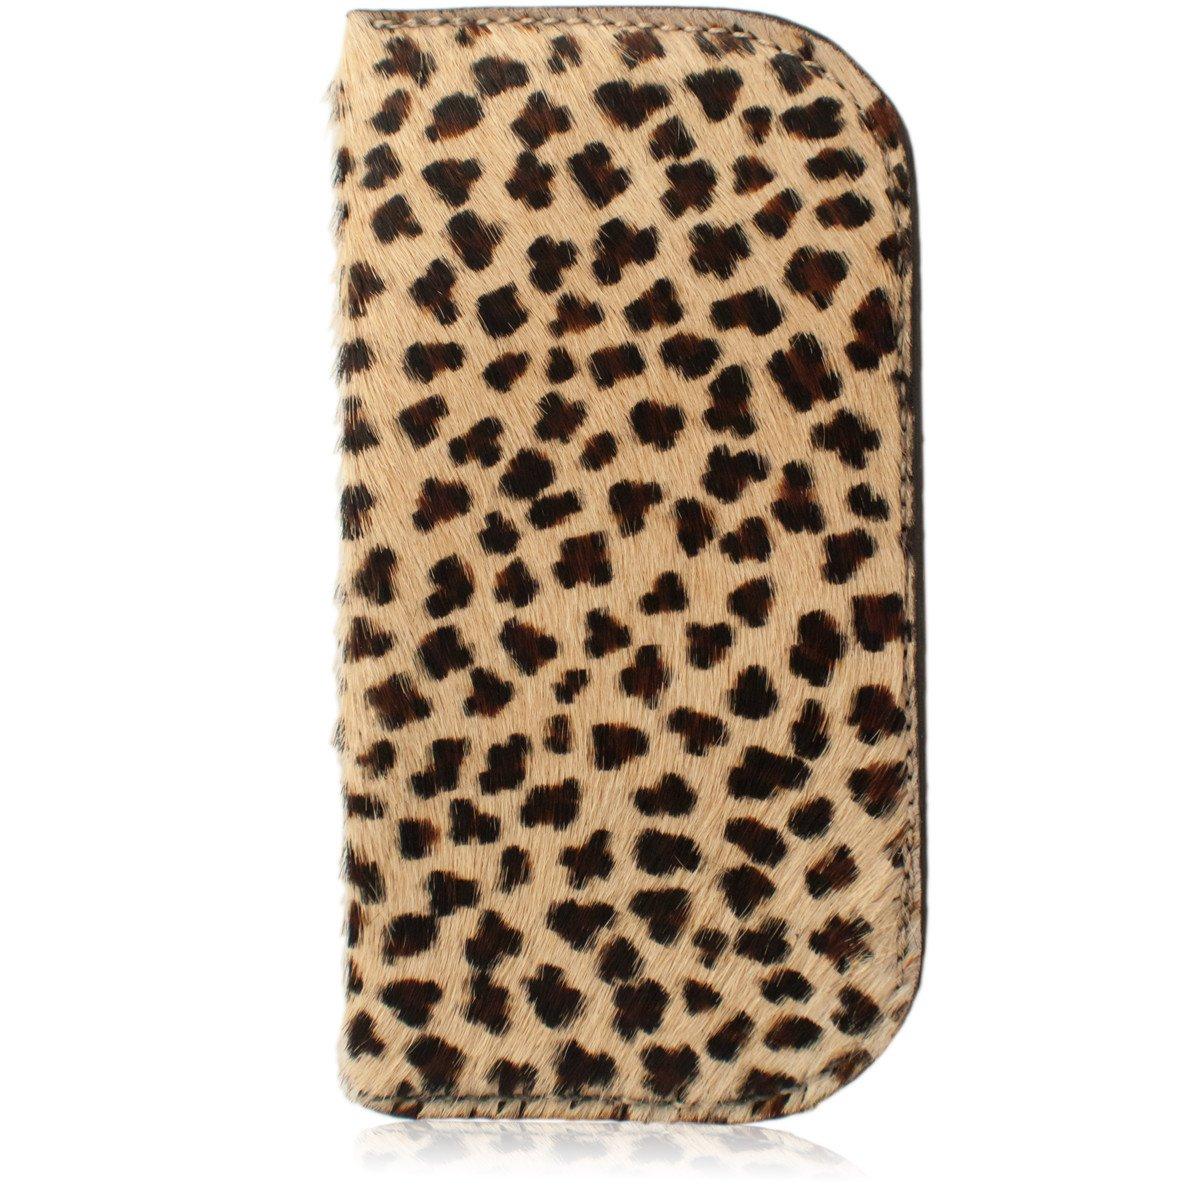 Furry Cheetah Leopard Print Genuine Leather Soft Glasses Case